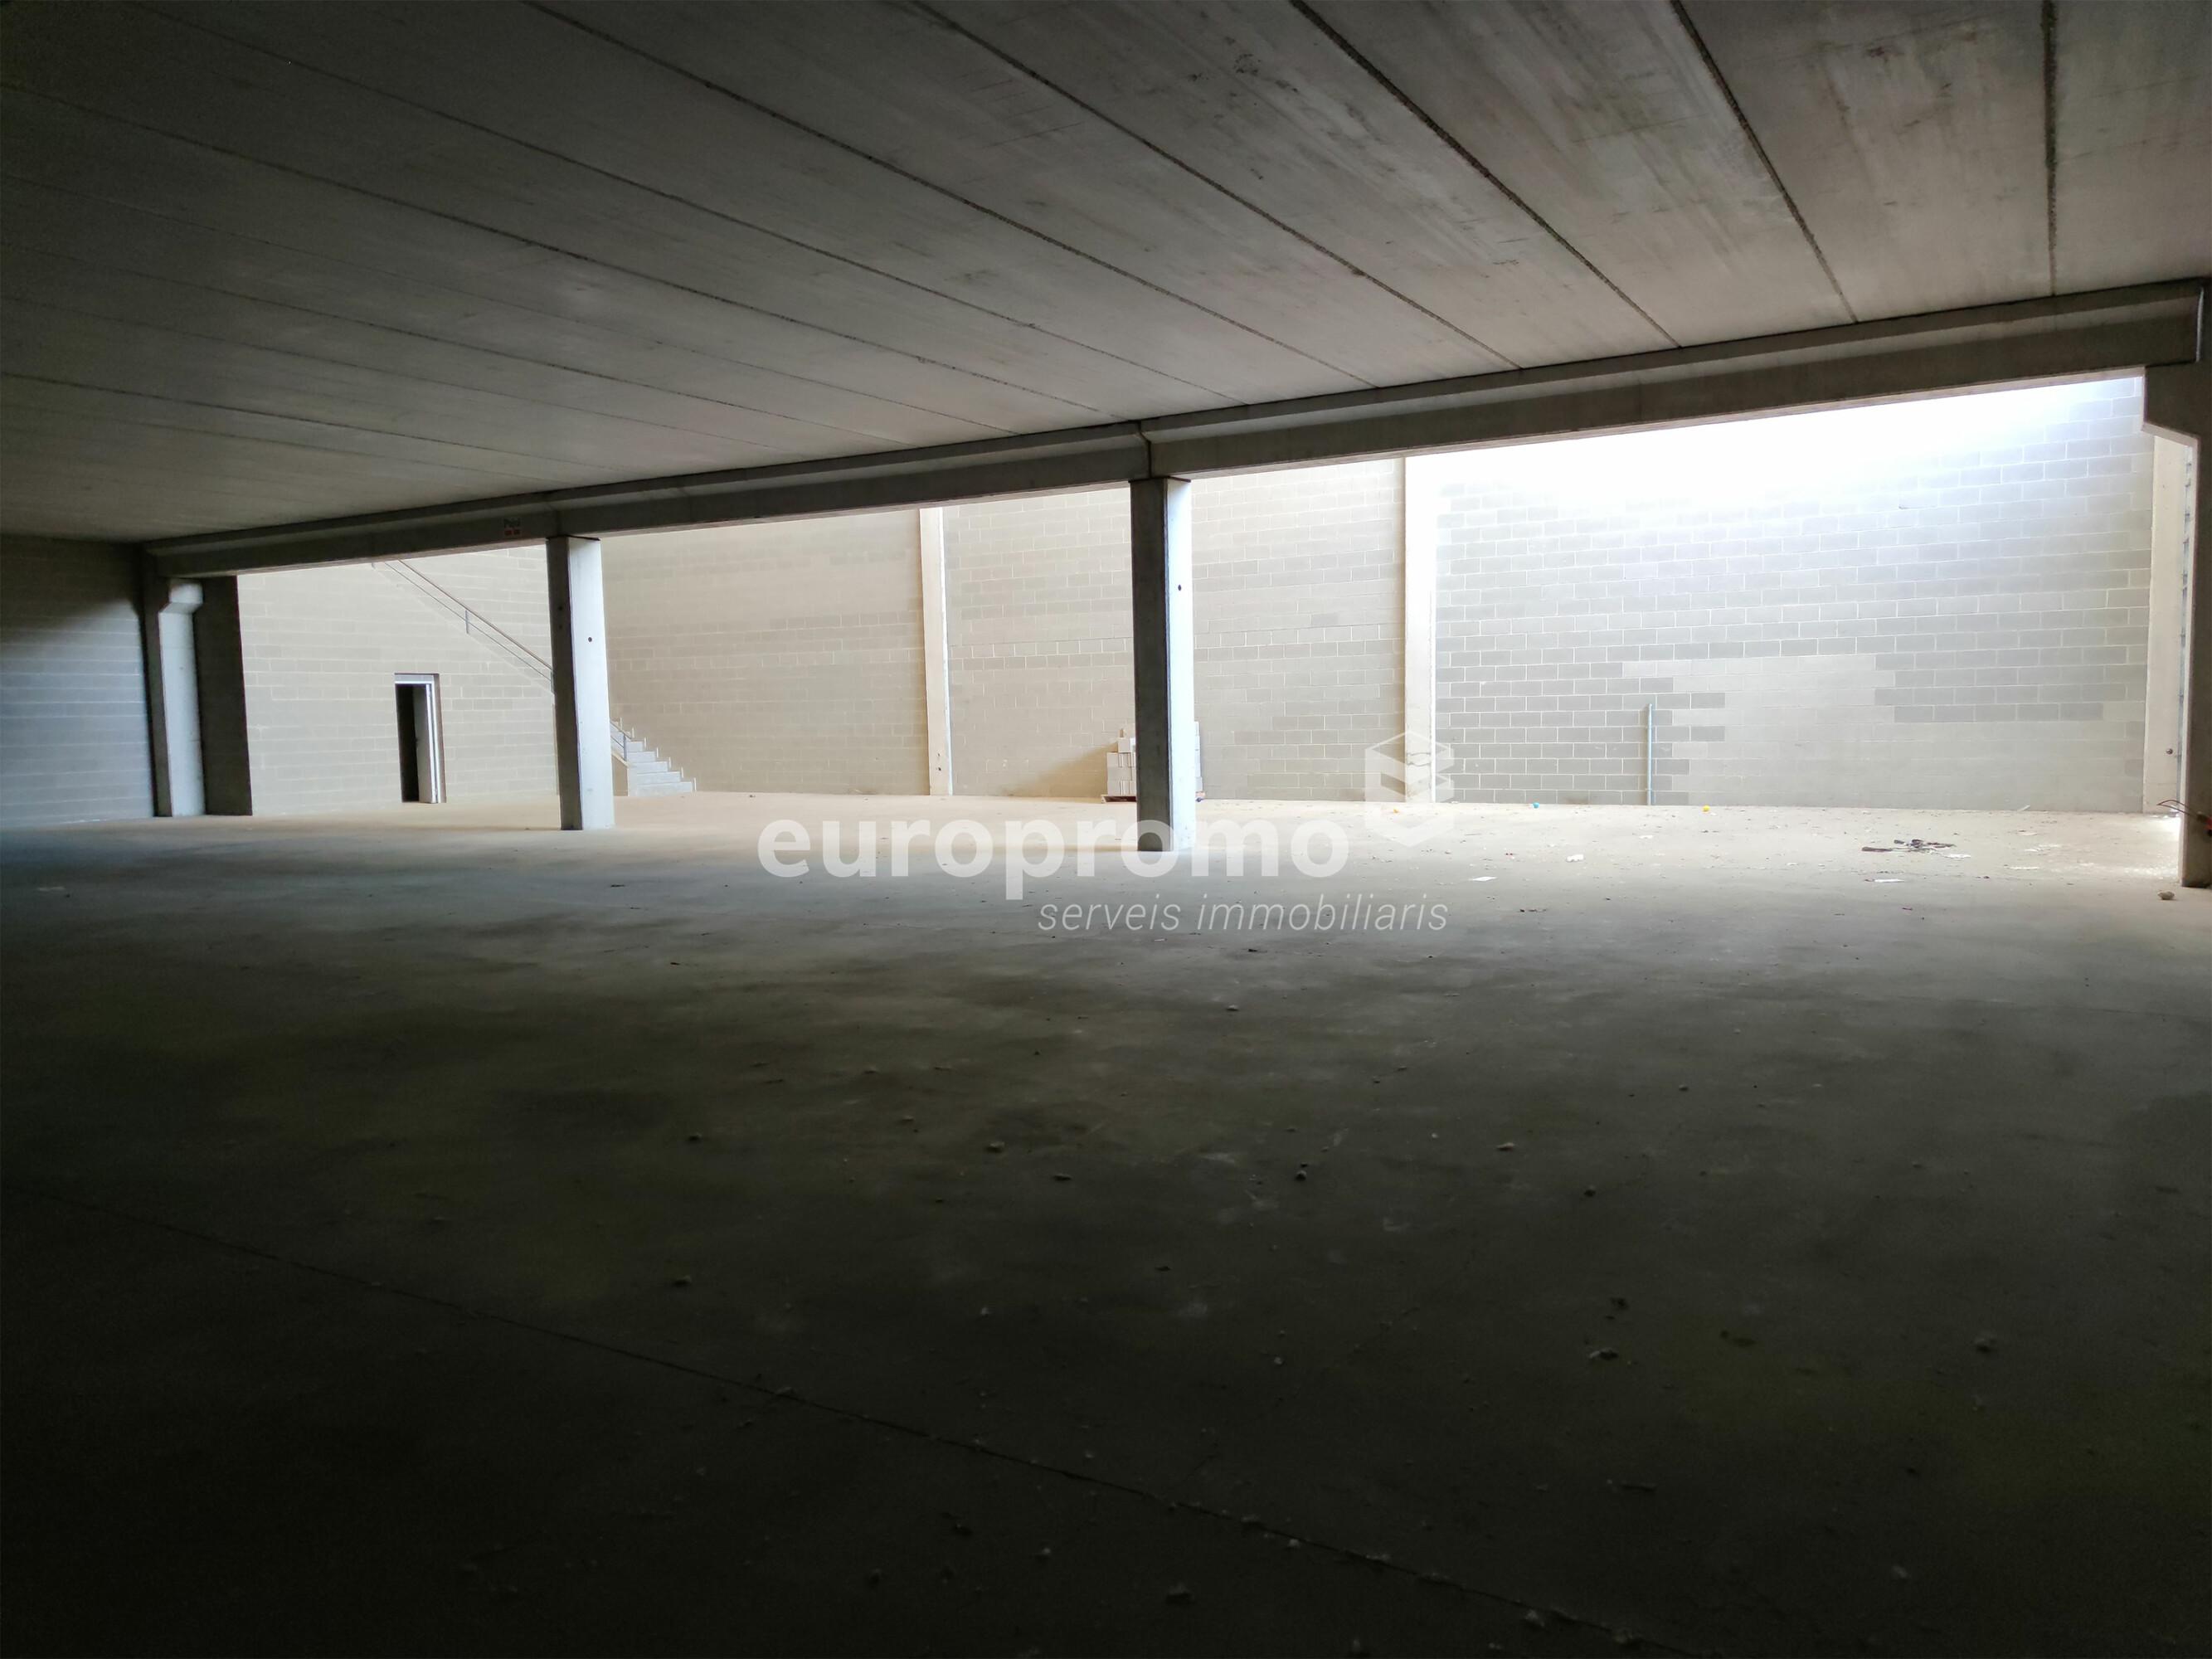 Nave de 1100 m² muy bien situada en Mas Xirgu